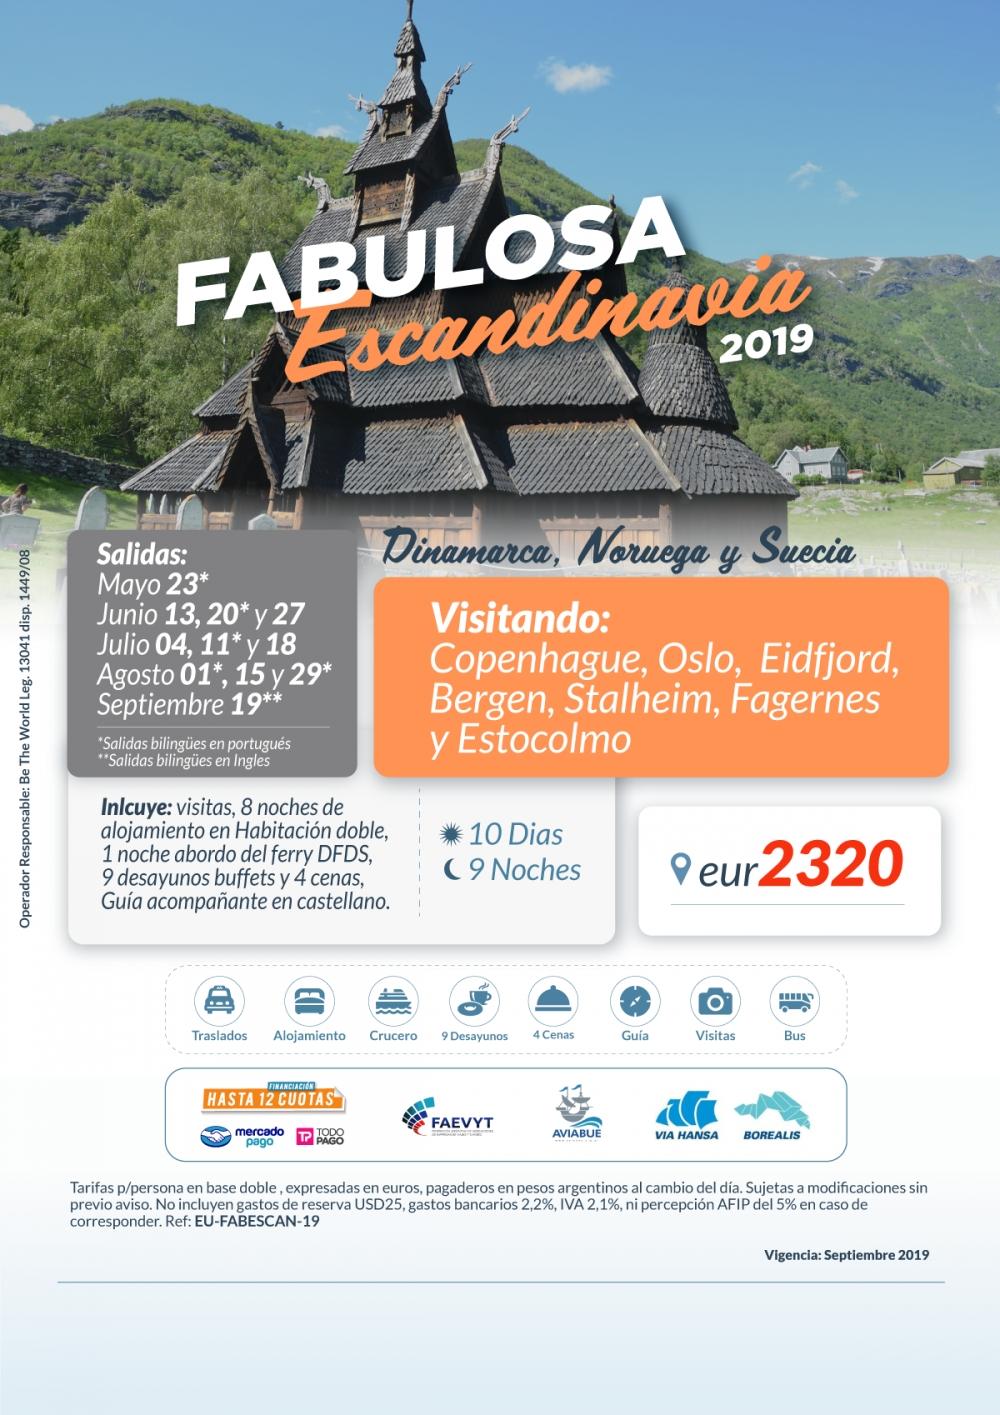 FABULOSA ESCANDINAVIA - Salidas Mayo a Septiembre